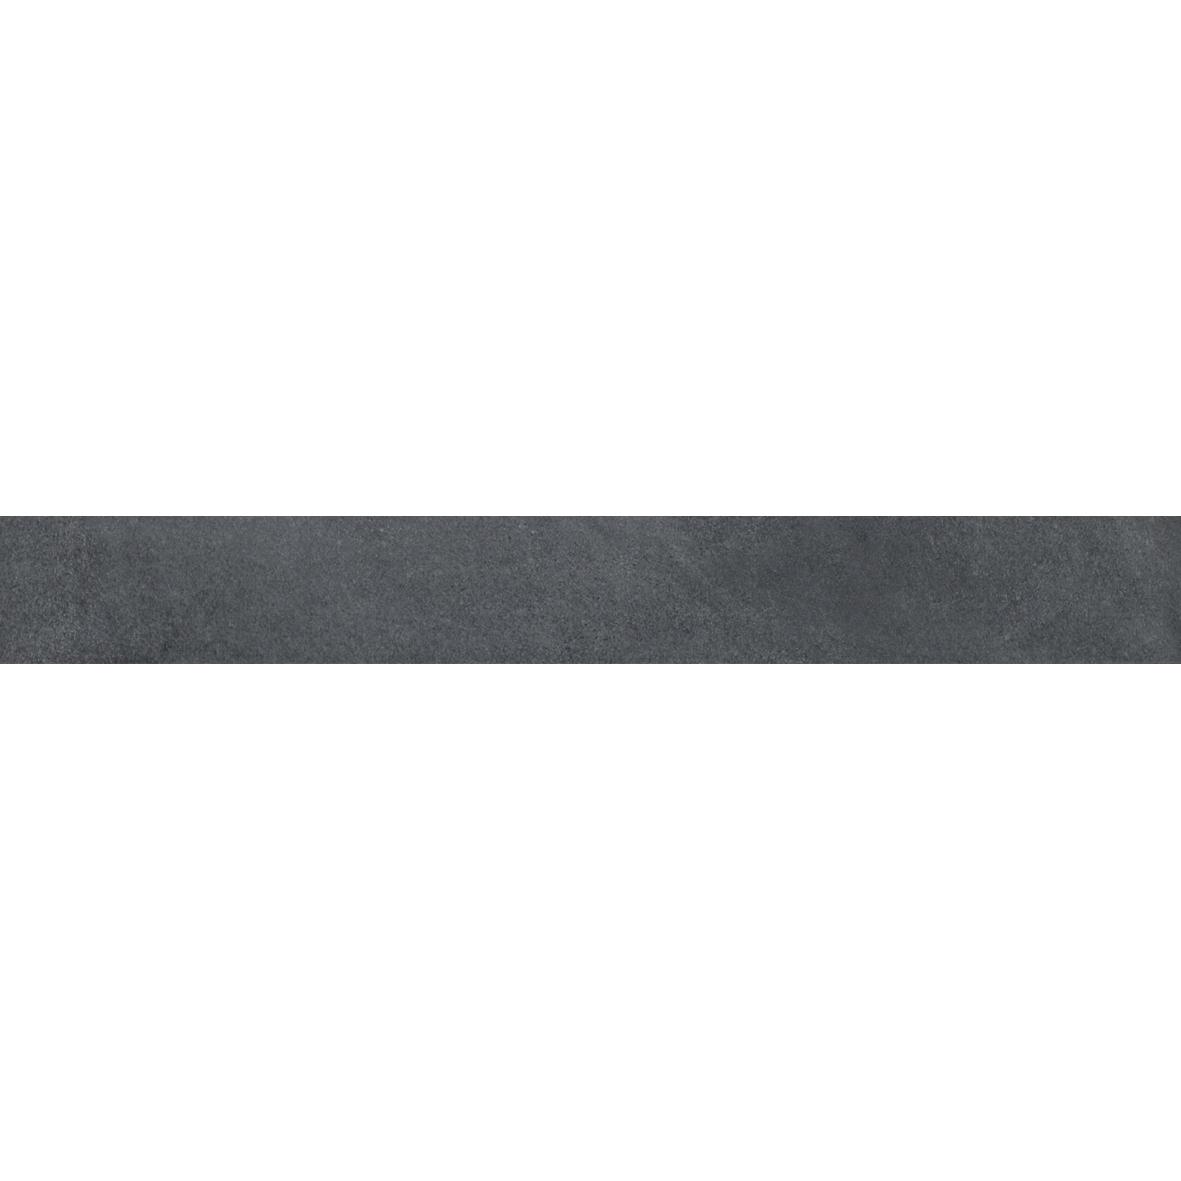 Klinker Arredo Anderstone Black 8×60 cm